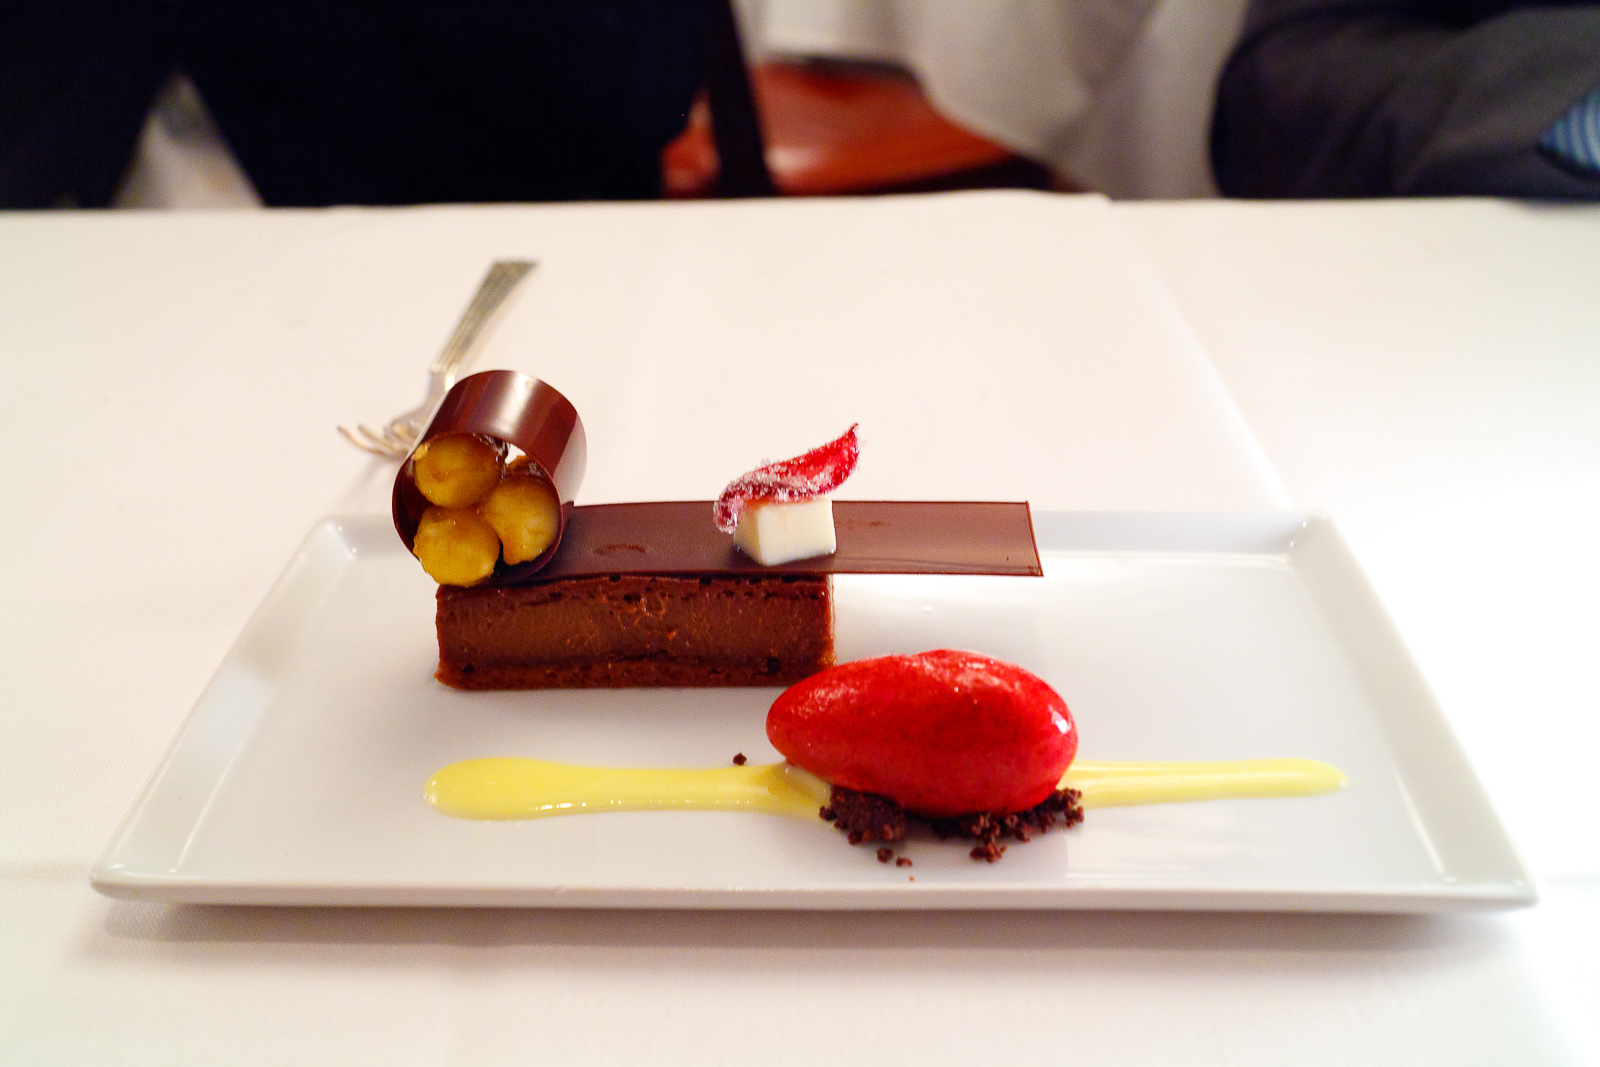 11th Course: Chocolate, hibiscus, banana, cinnamon